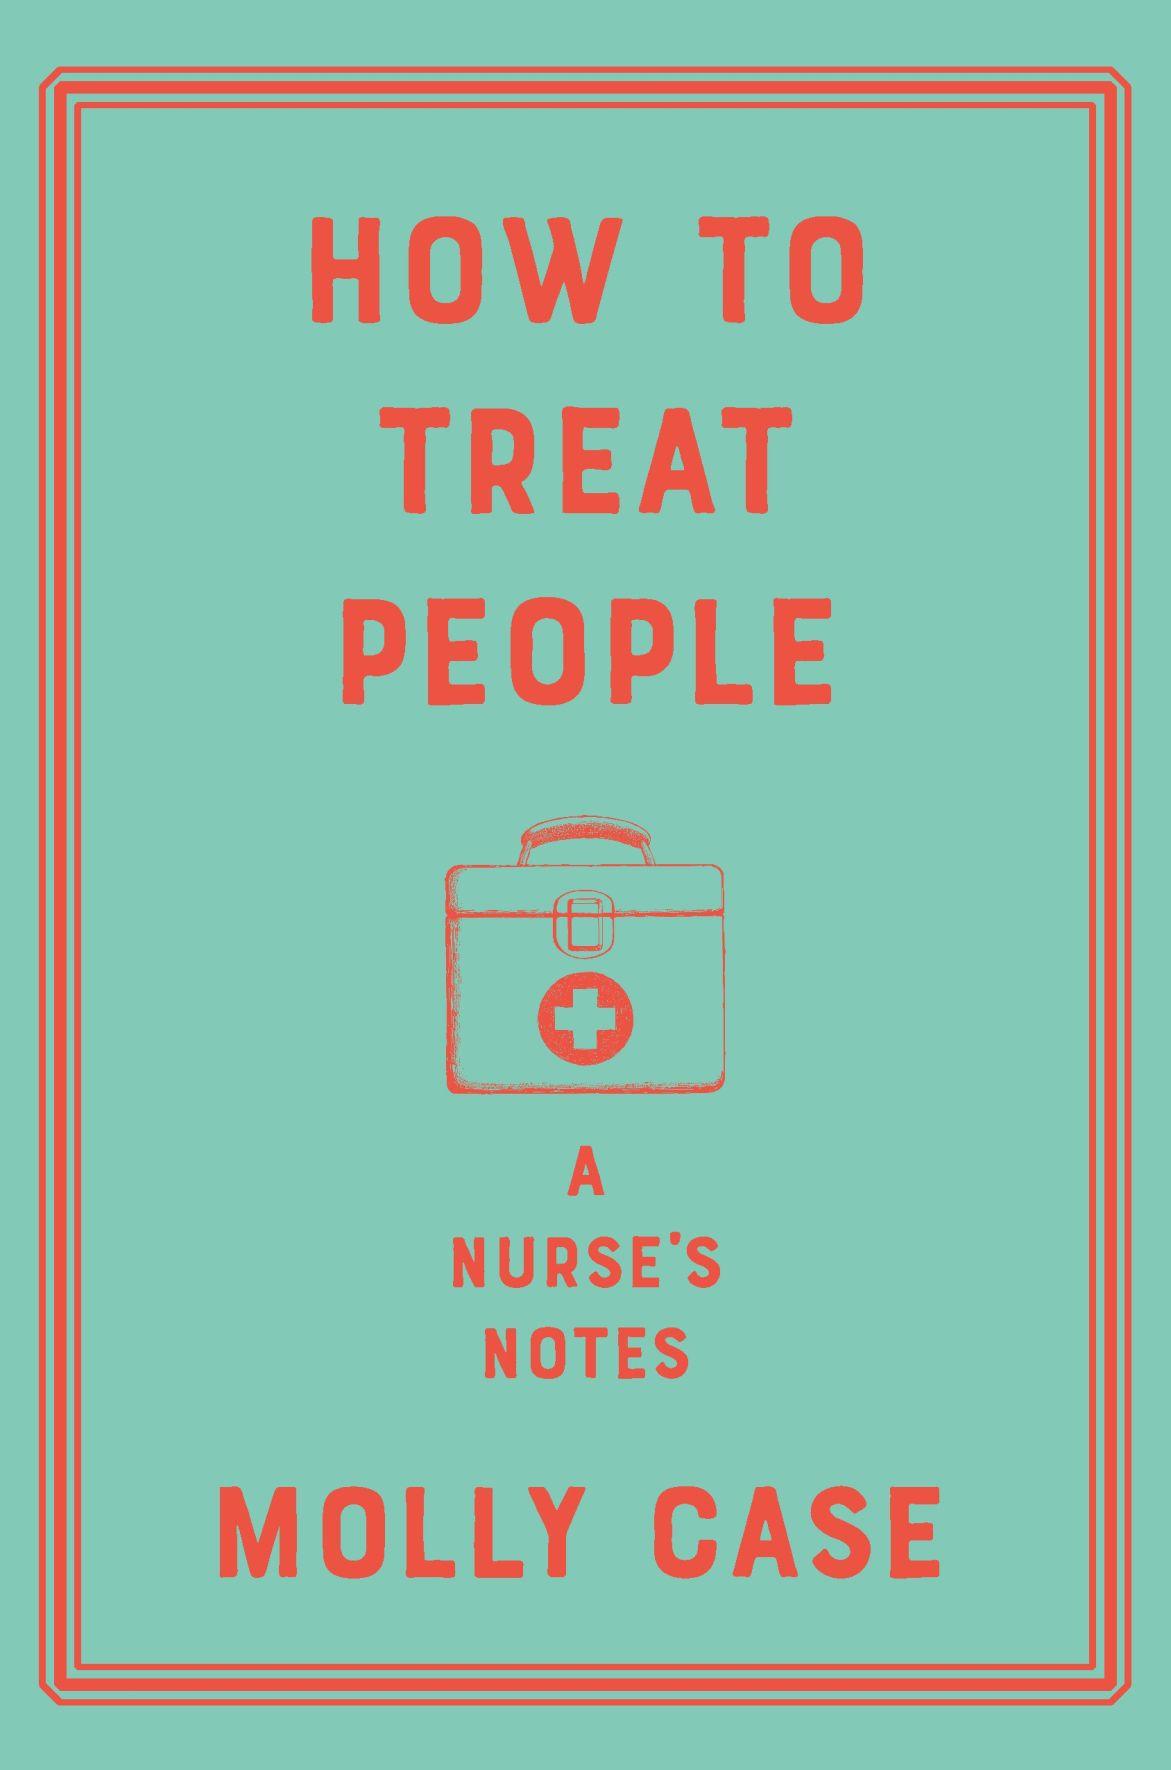 Nurse's memoir offers vivid account with lyrical prose